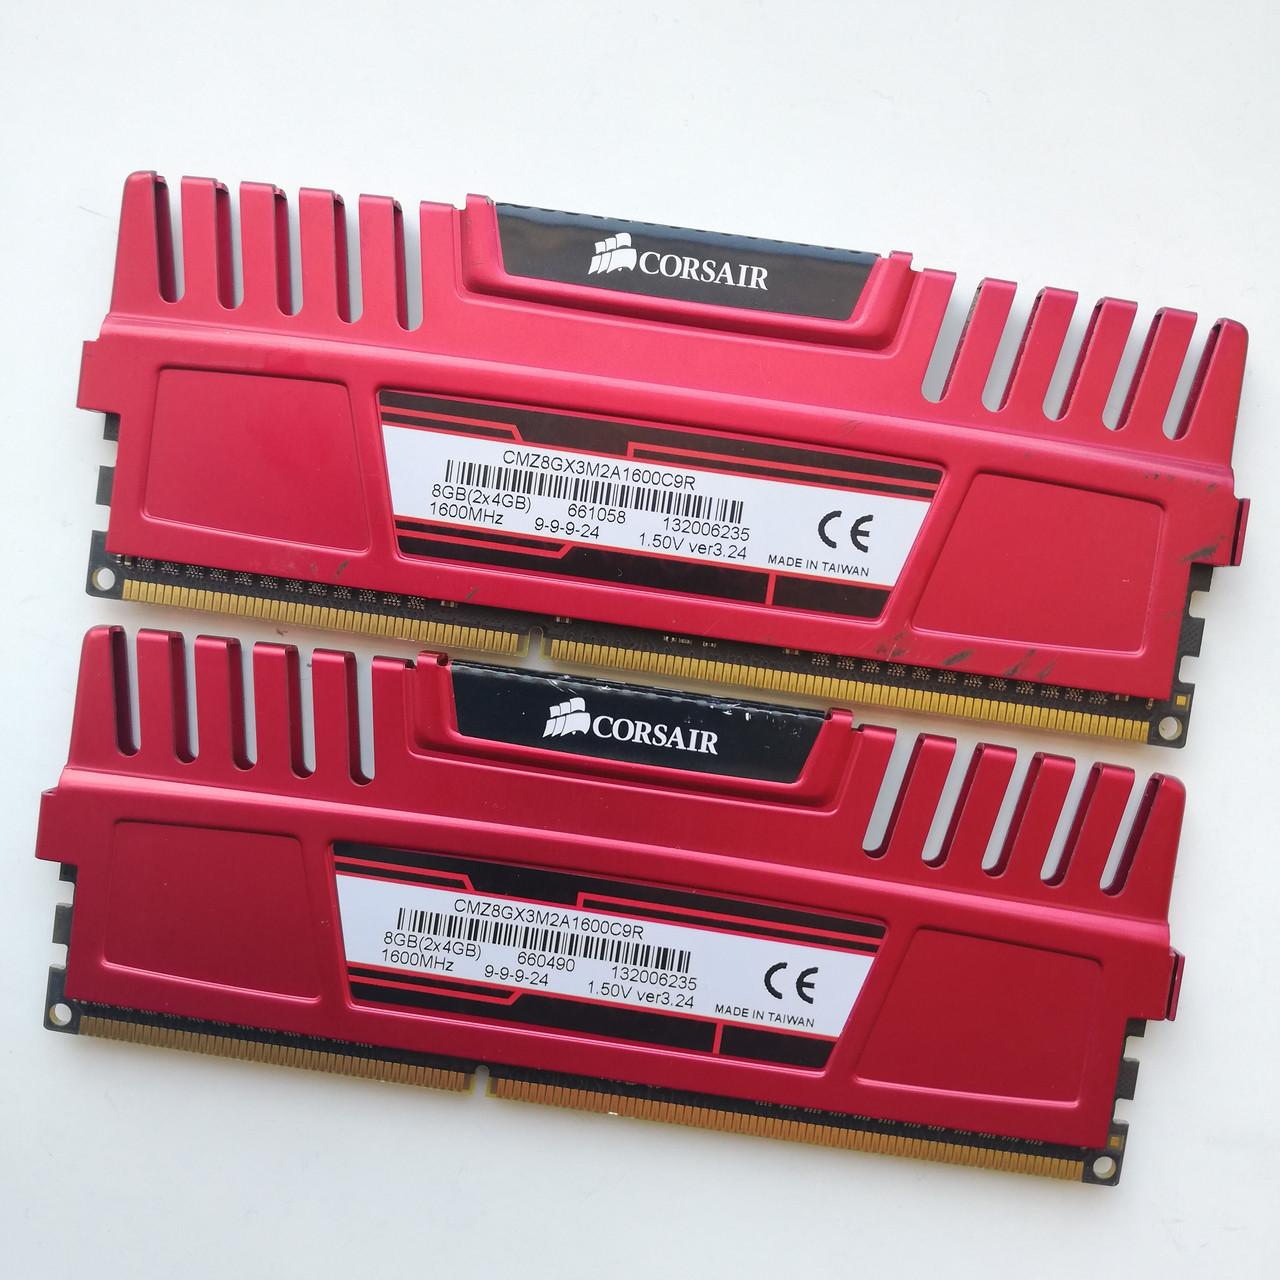 Комплект оперативной памяти Corsair Vengeance DDR3 8Gb (4Gb+4Gb) 1600MHz 12800U CL9 (CMZ8GX3M2A1600C9R) Б/У